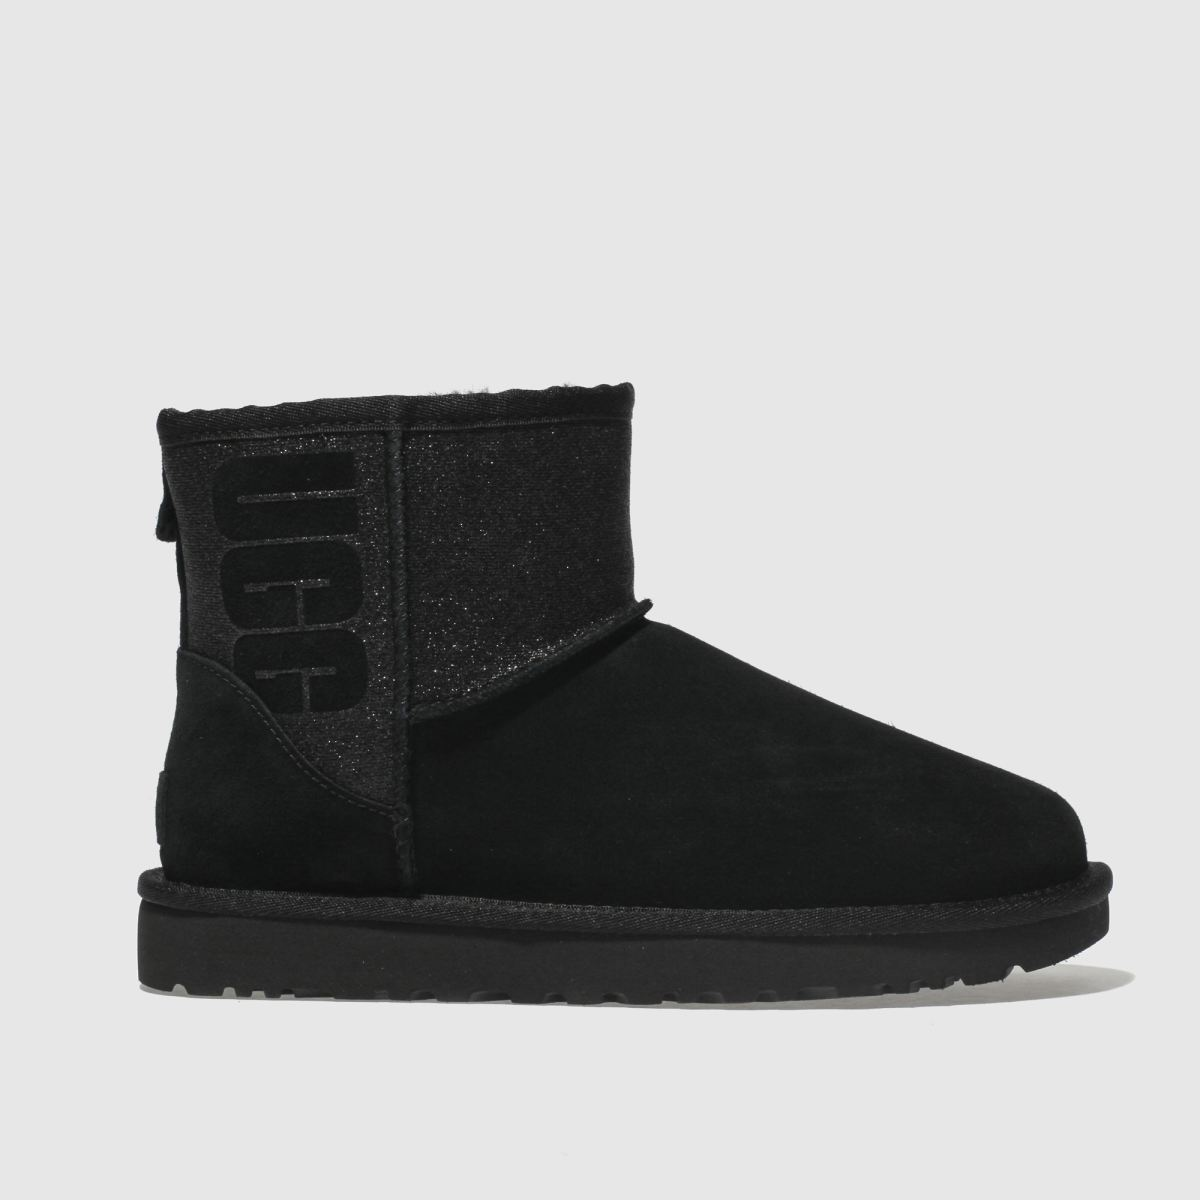 Ugg Black Classic Mini Sparkle Boots